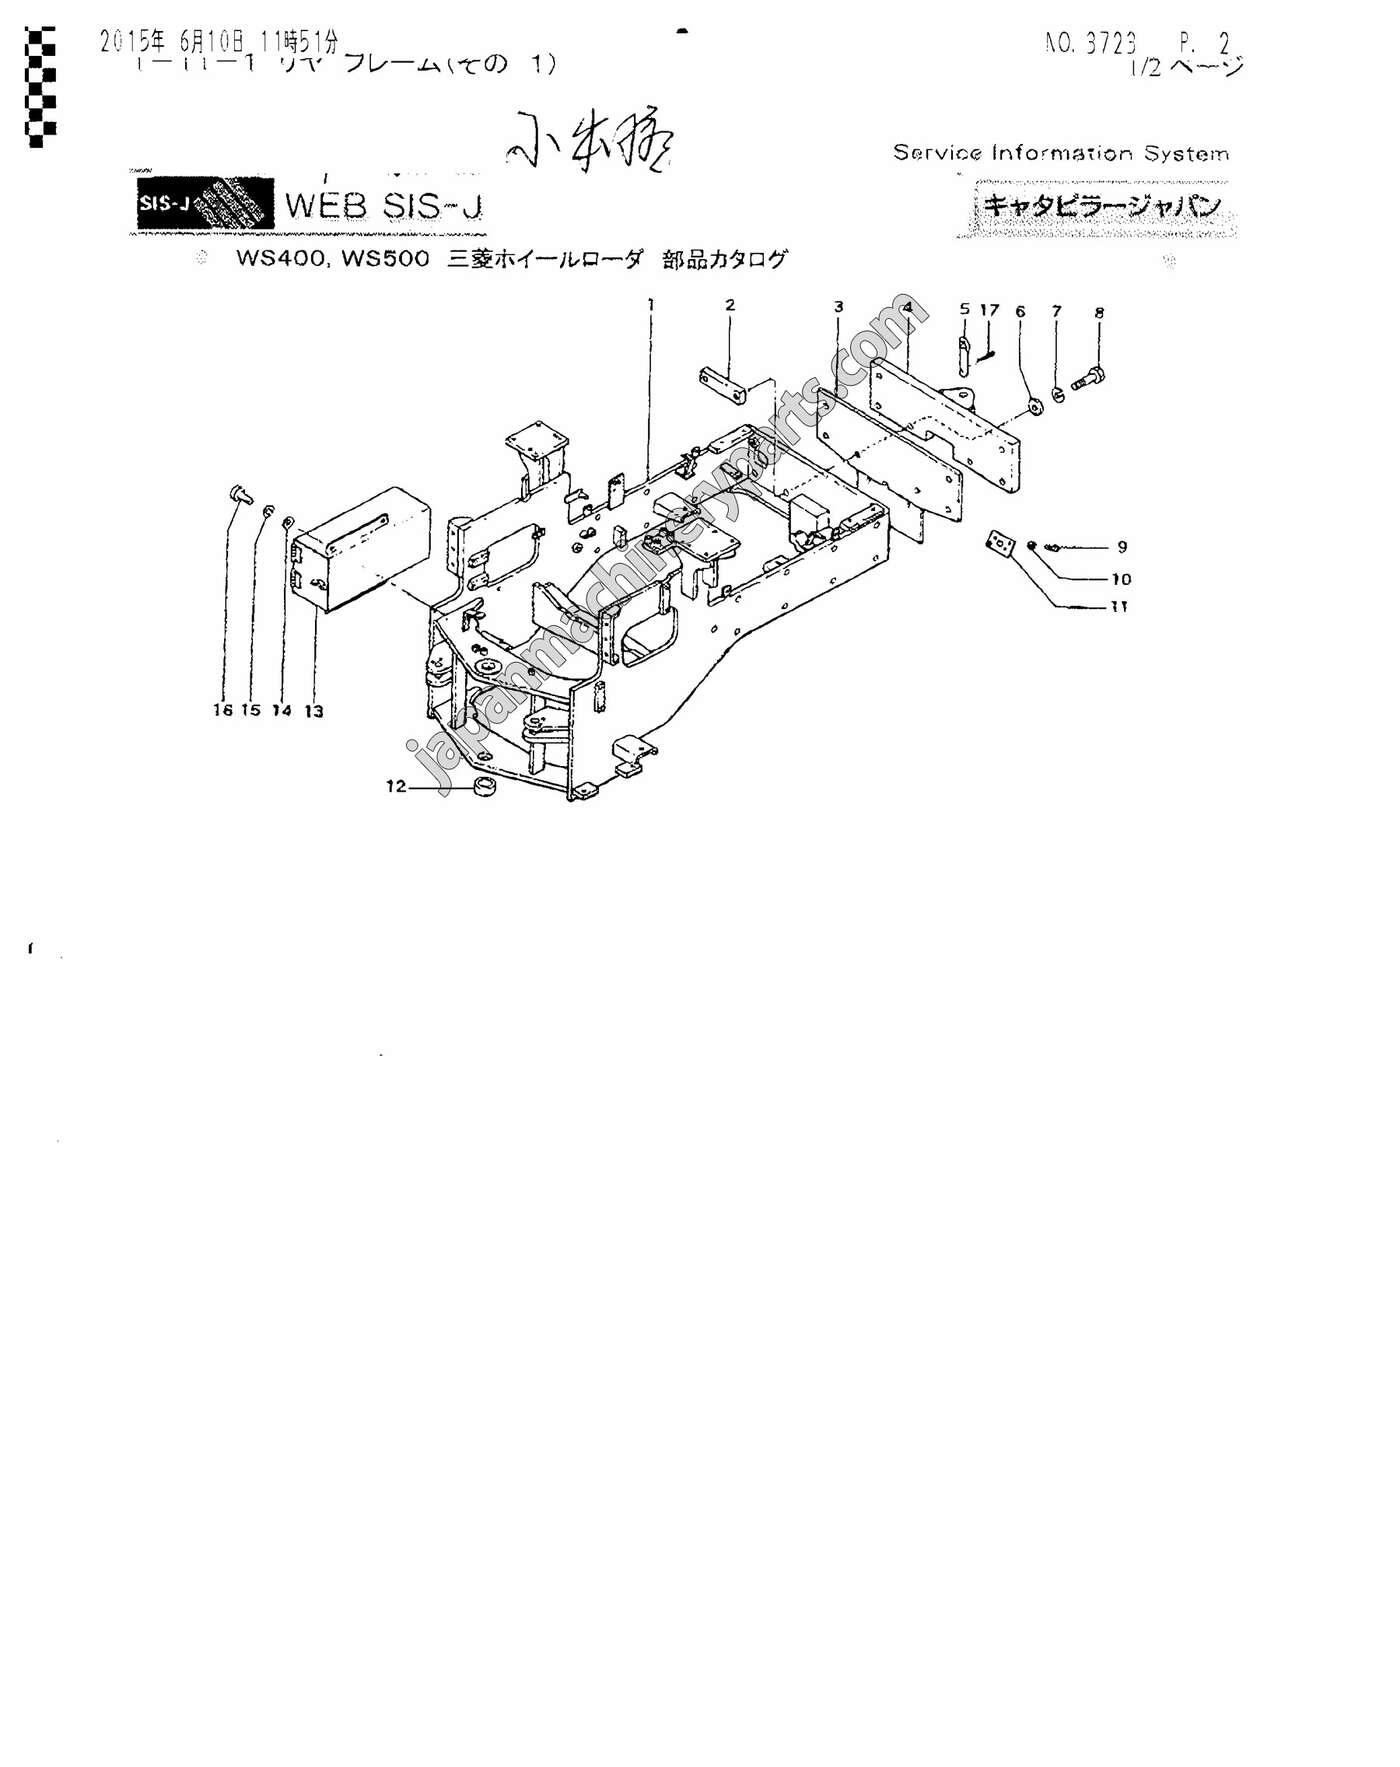 2002 Isuzu Rodeo Engine Parts Diagram Electrical Wiring Diagrams Fr Diy Enthusiasts U2022 Ls